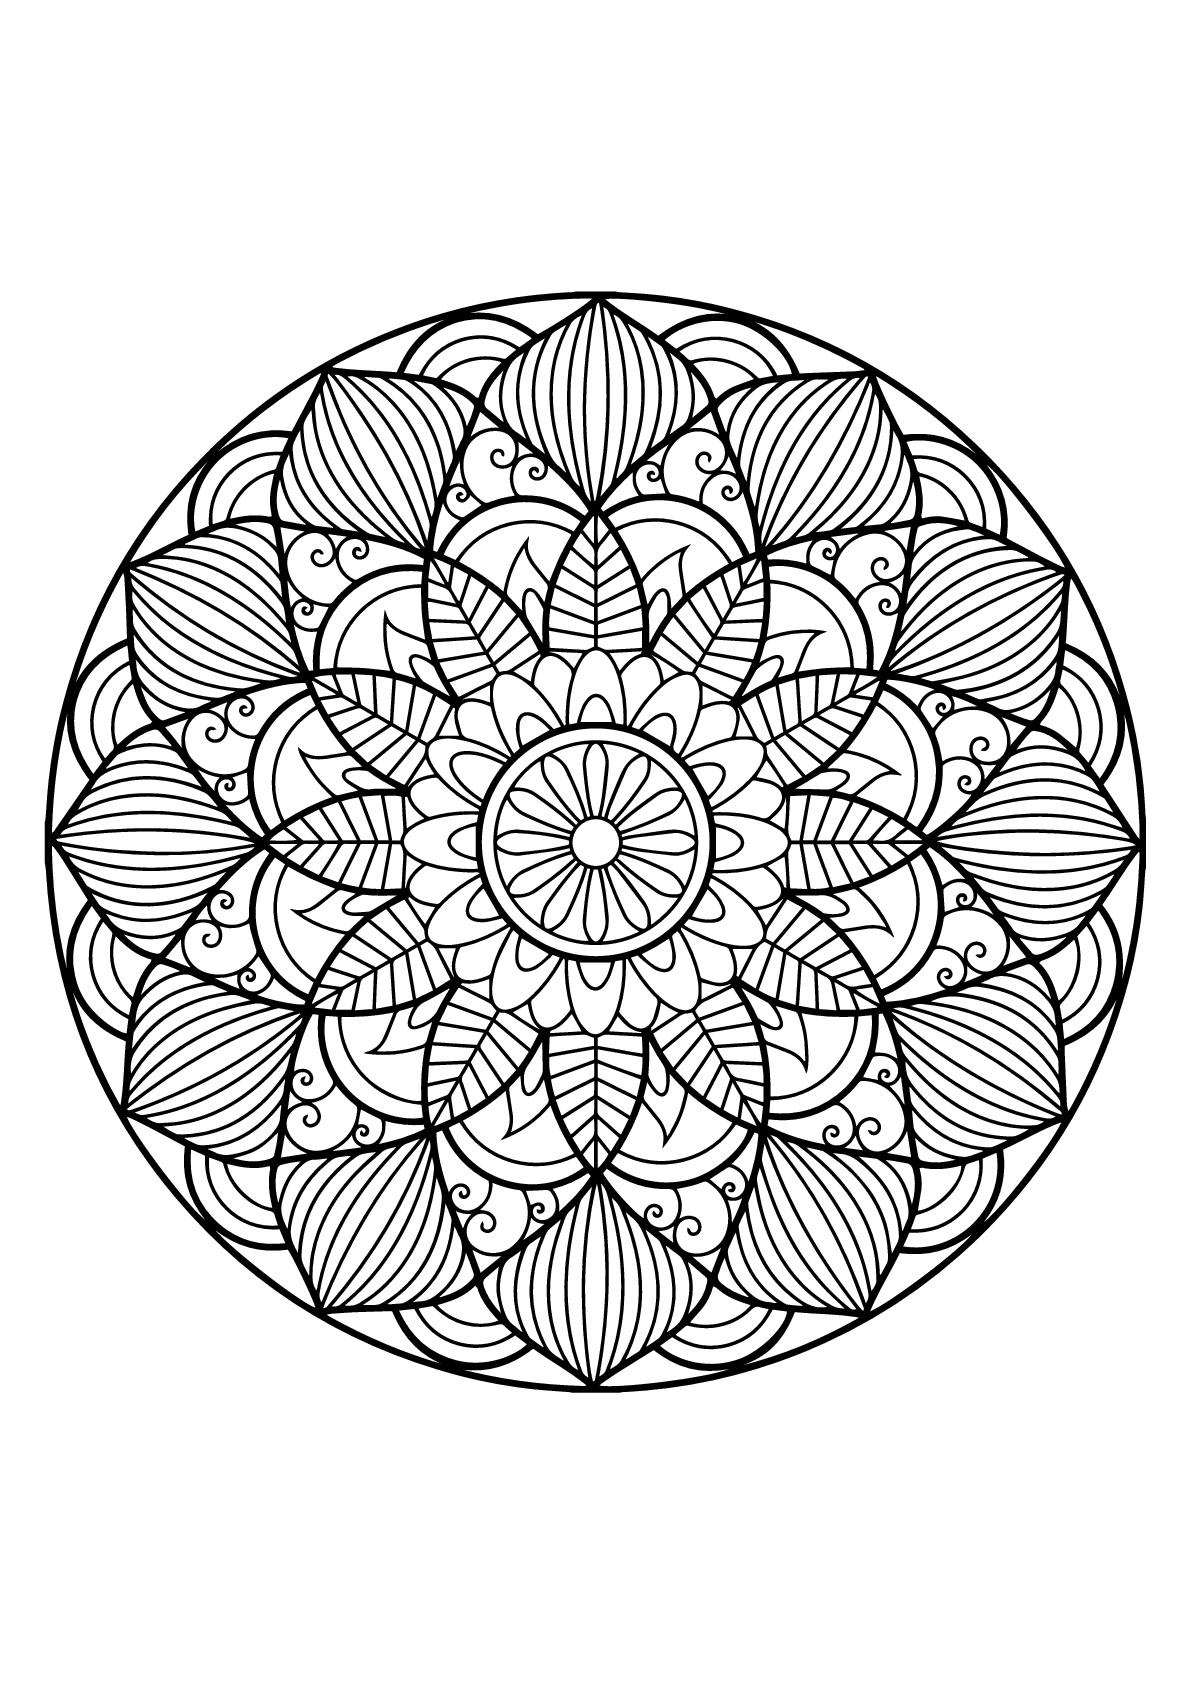 Mandala complexe livre gratuit 30 - Coloriage Mandalas ...